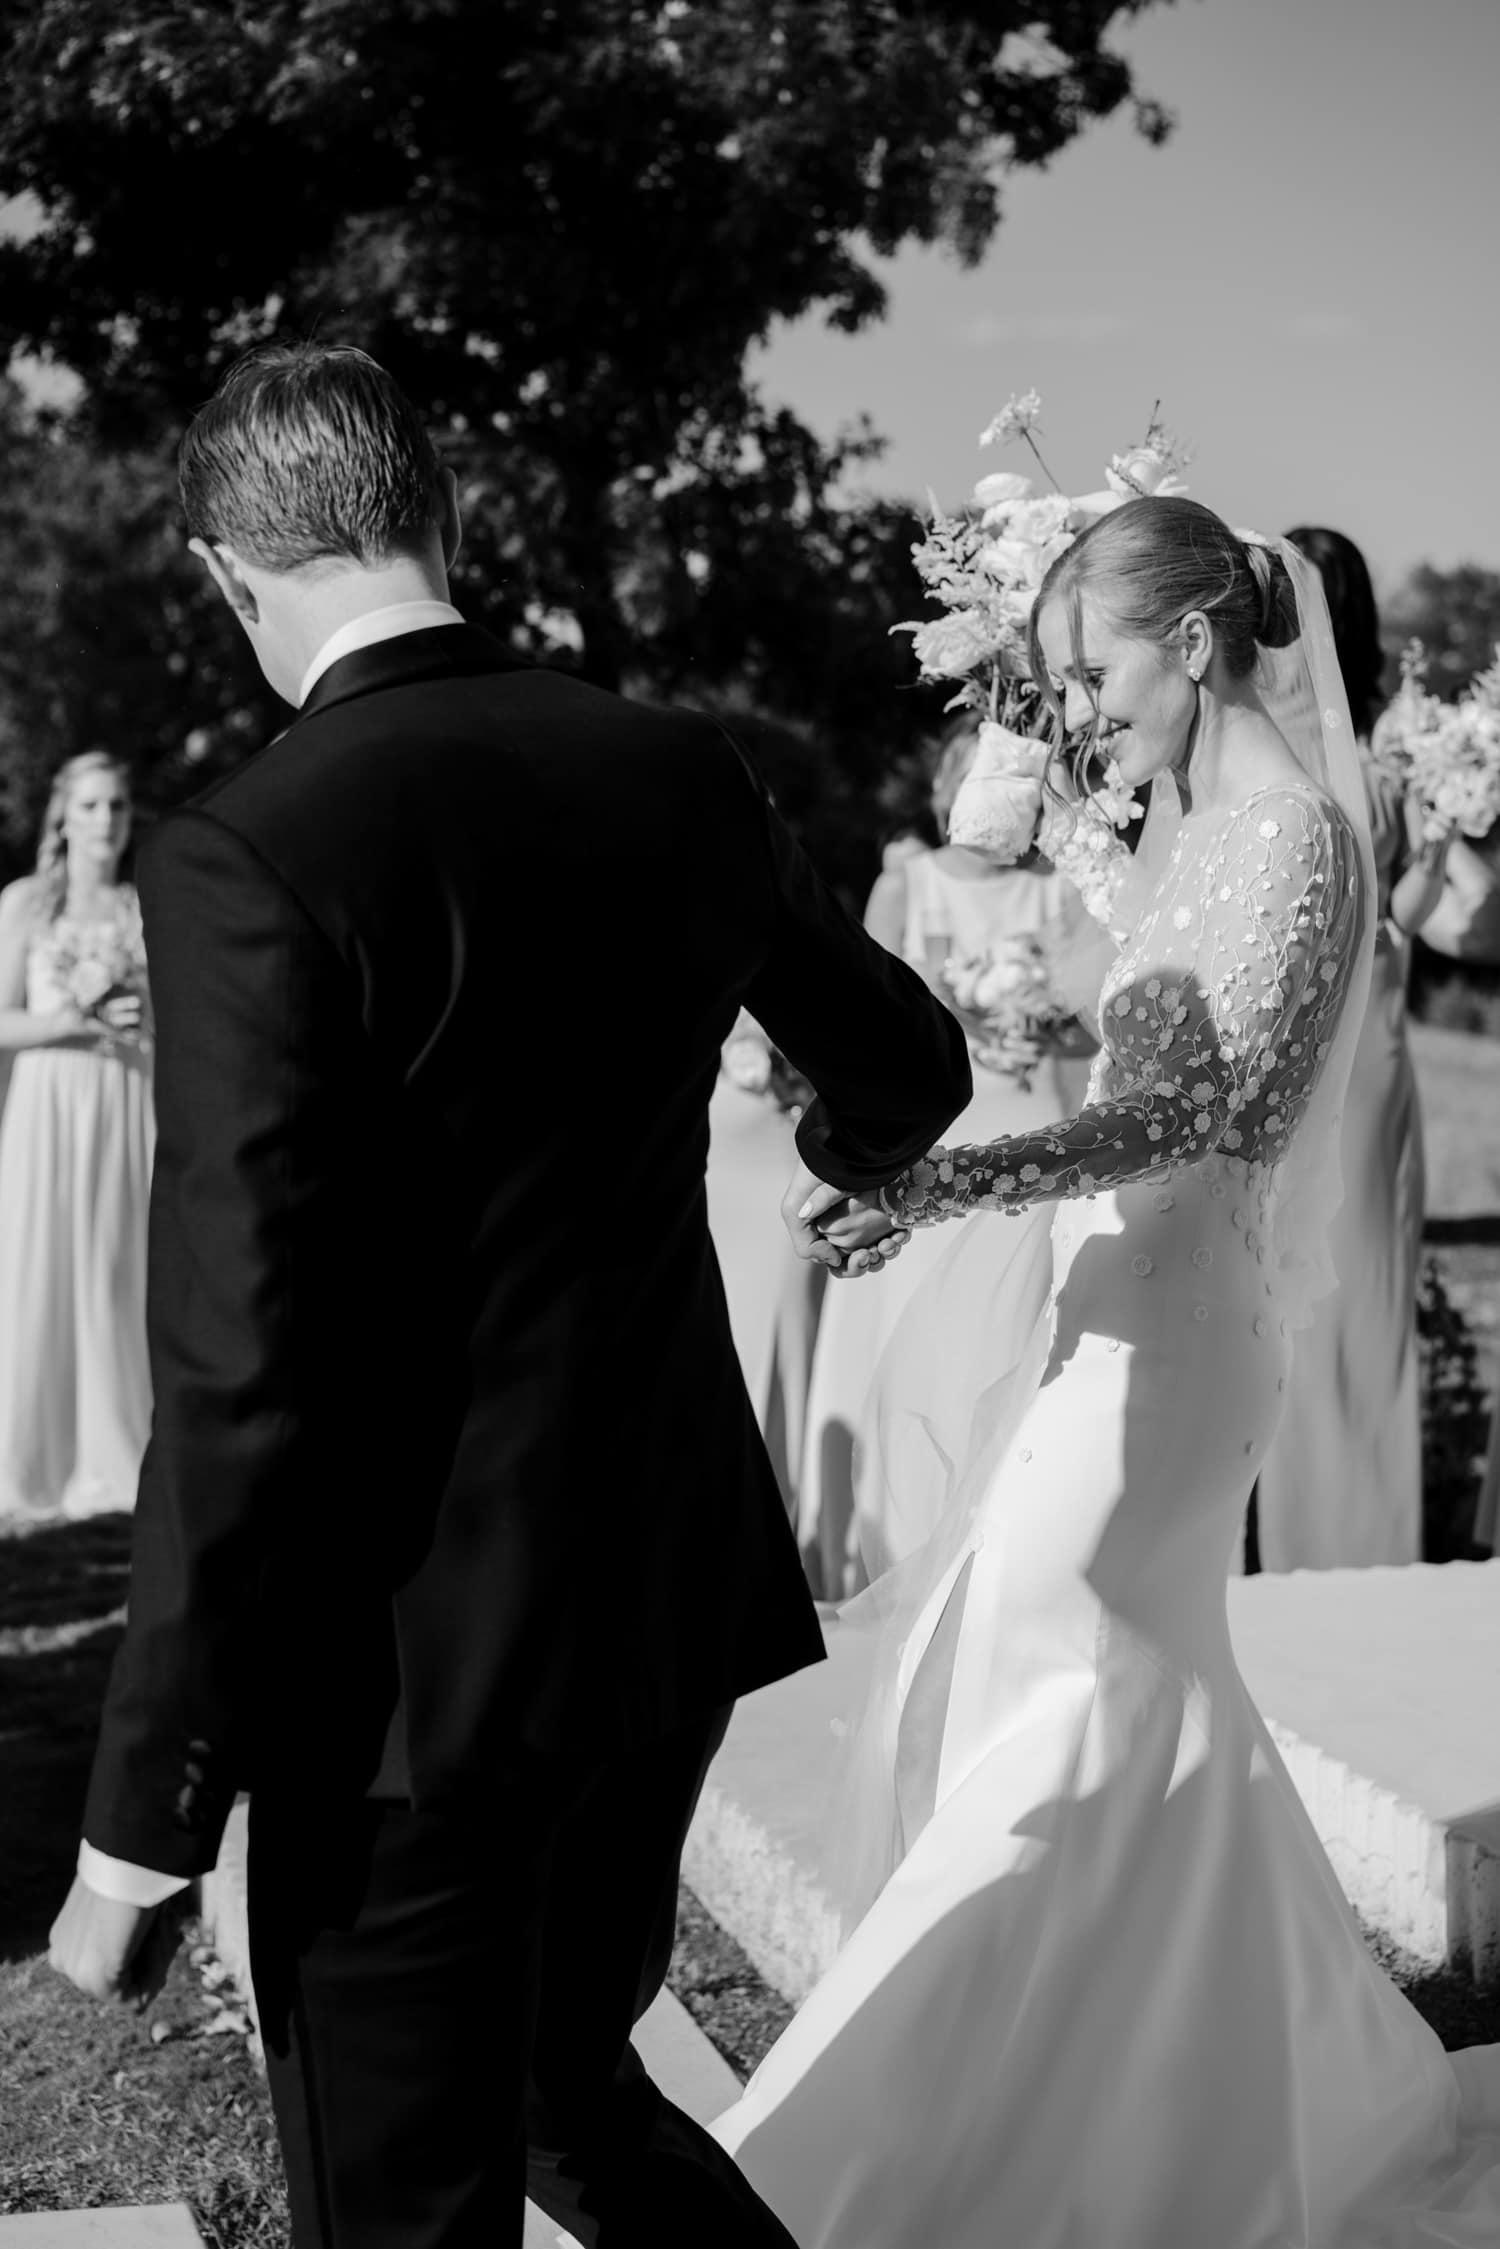 prospect-house-wedding-30.jpg